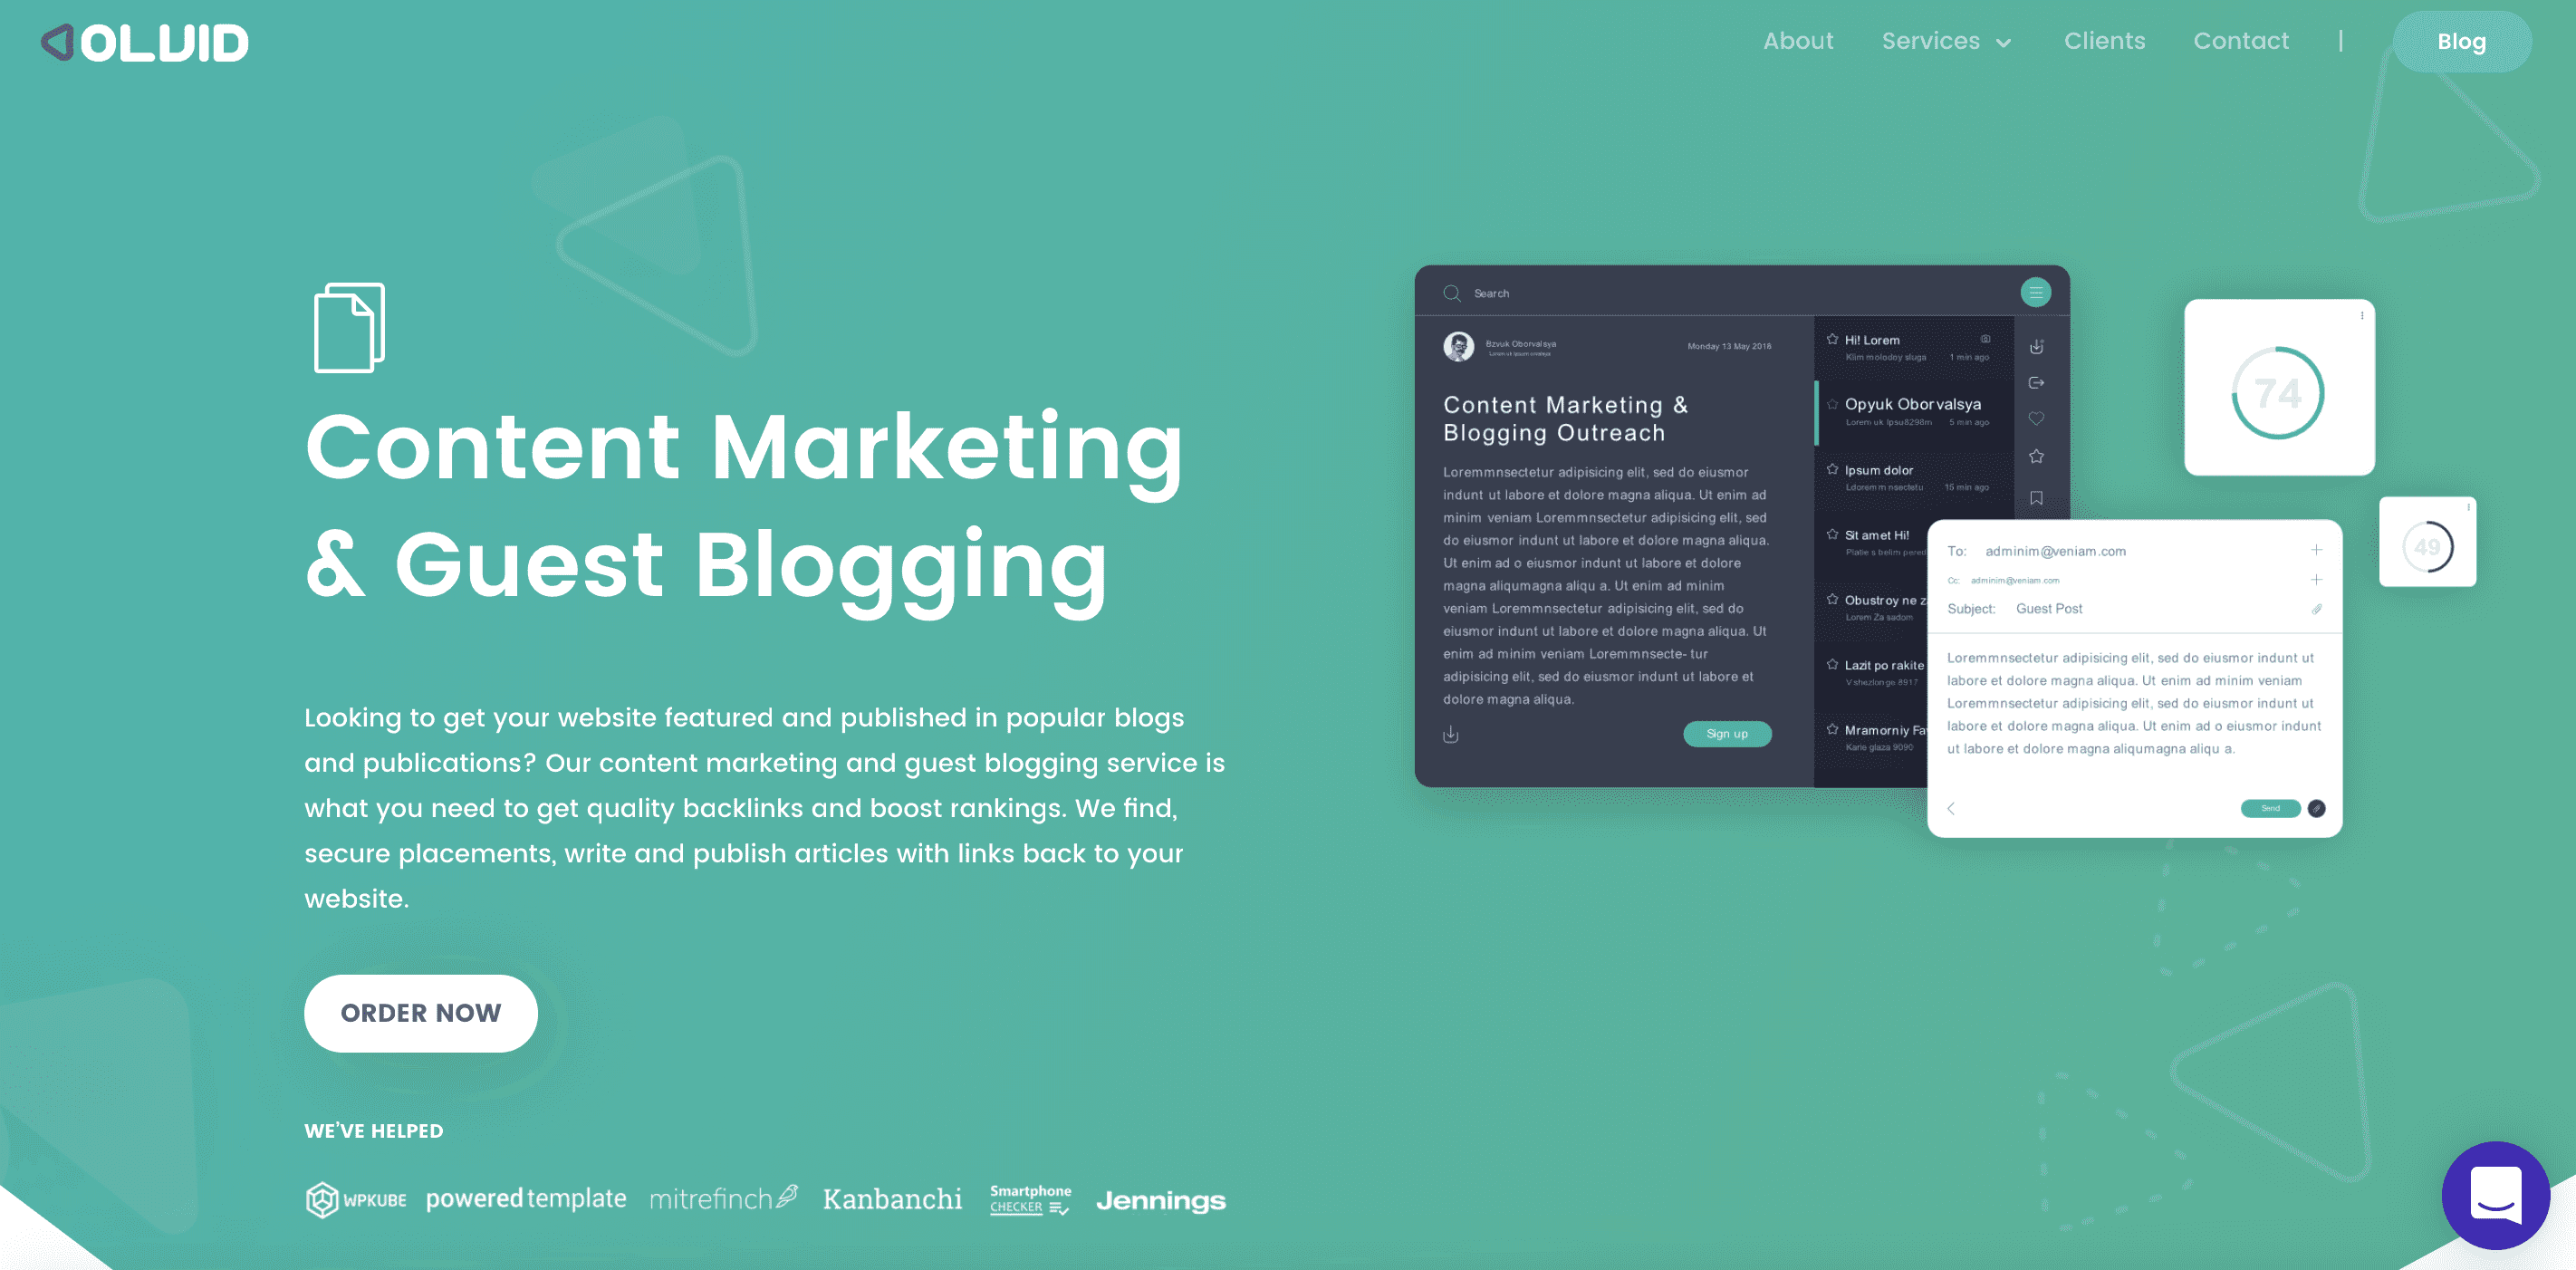 Solvid Guest Blogging